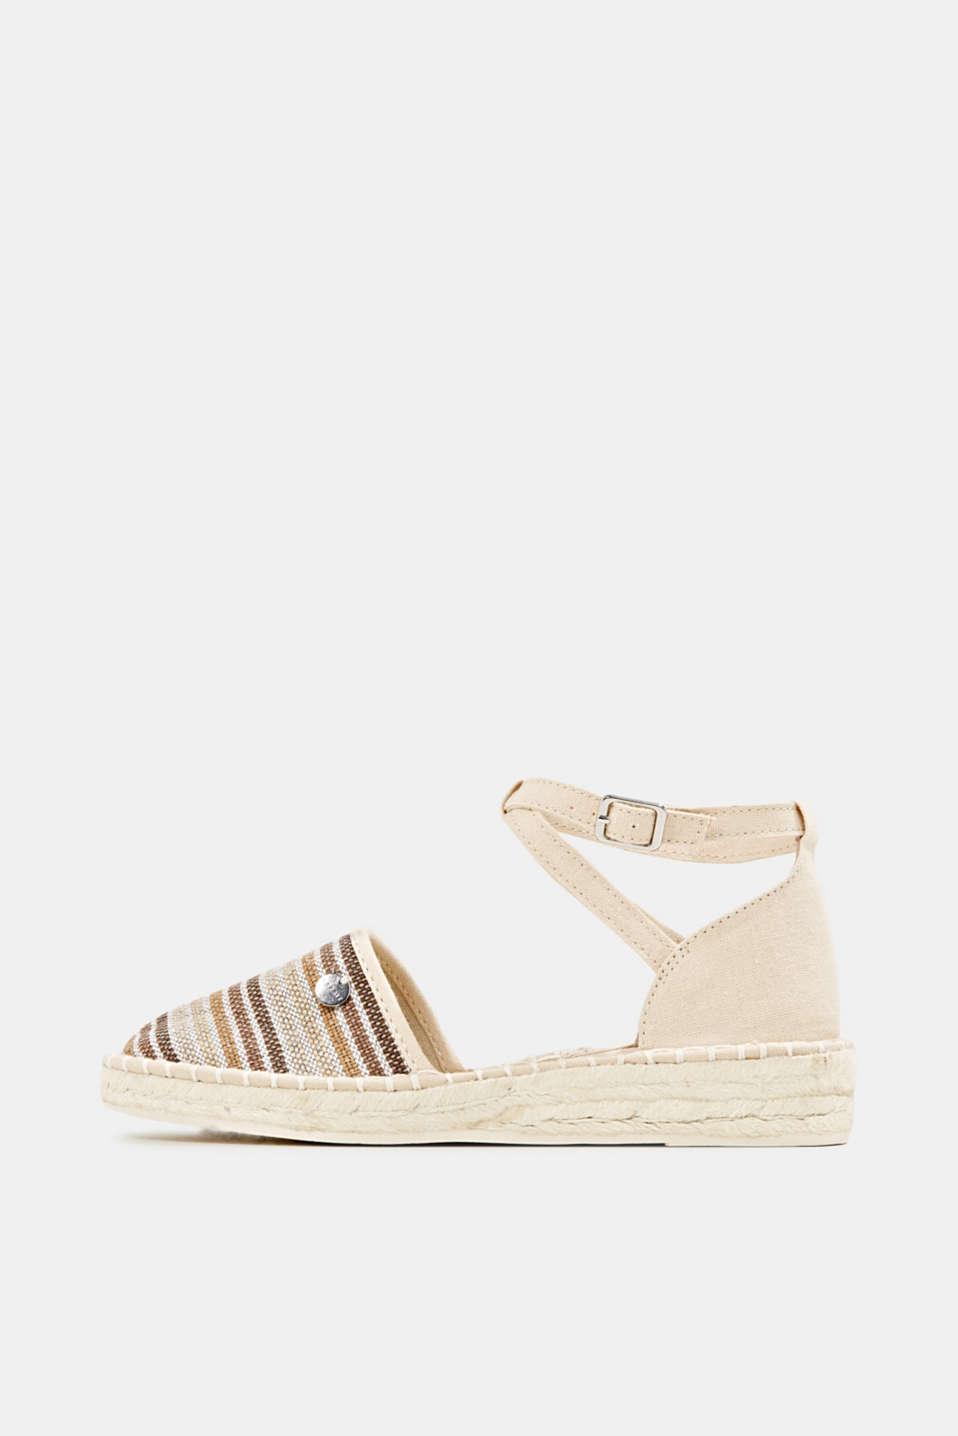 Espadrille sandals with stripes, CREAM BEIGE, detail image number 0